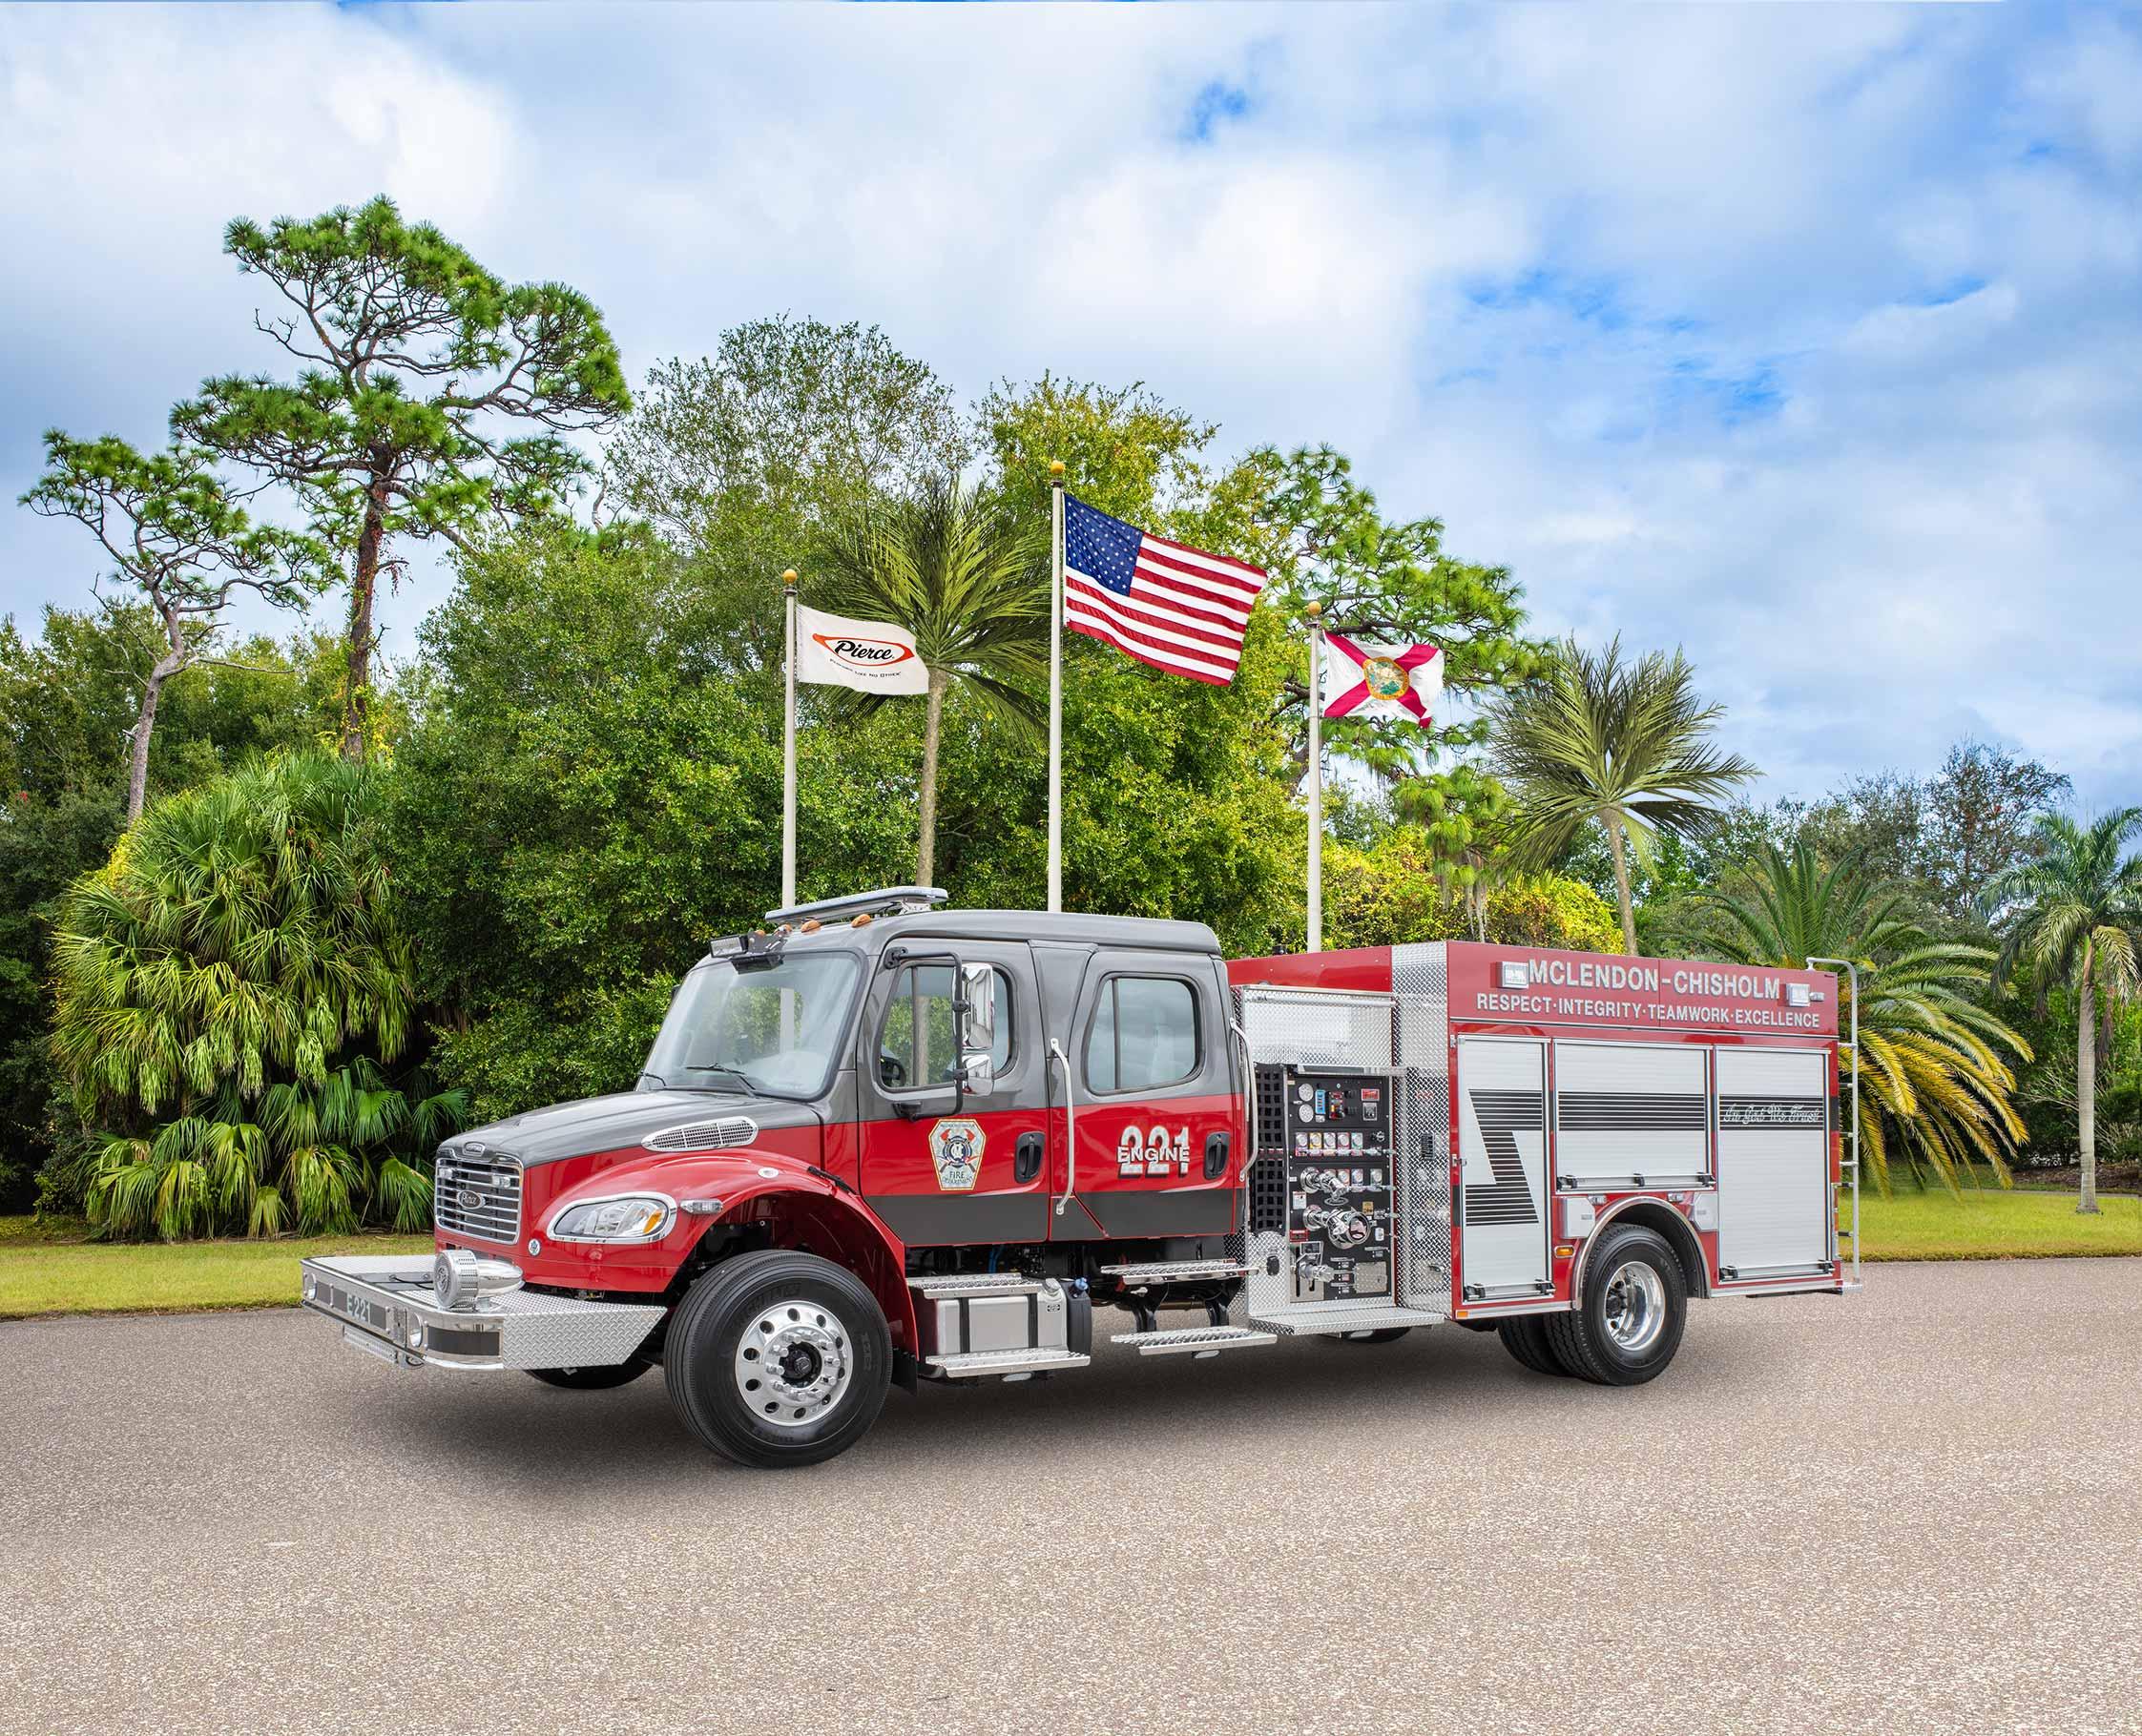 McLendon Chisholm Fire Department - Pumper